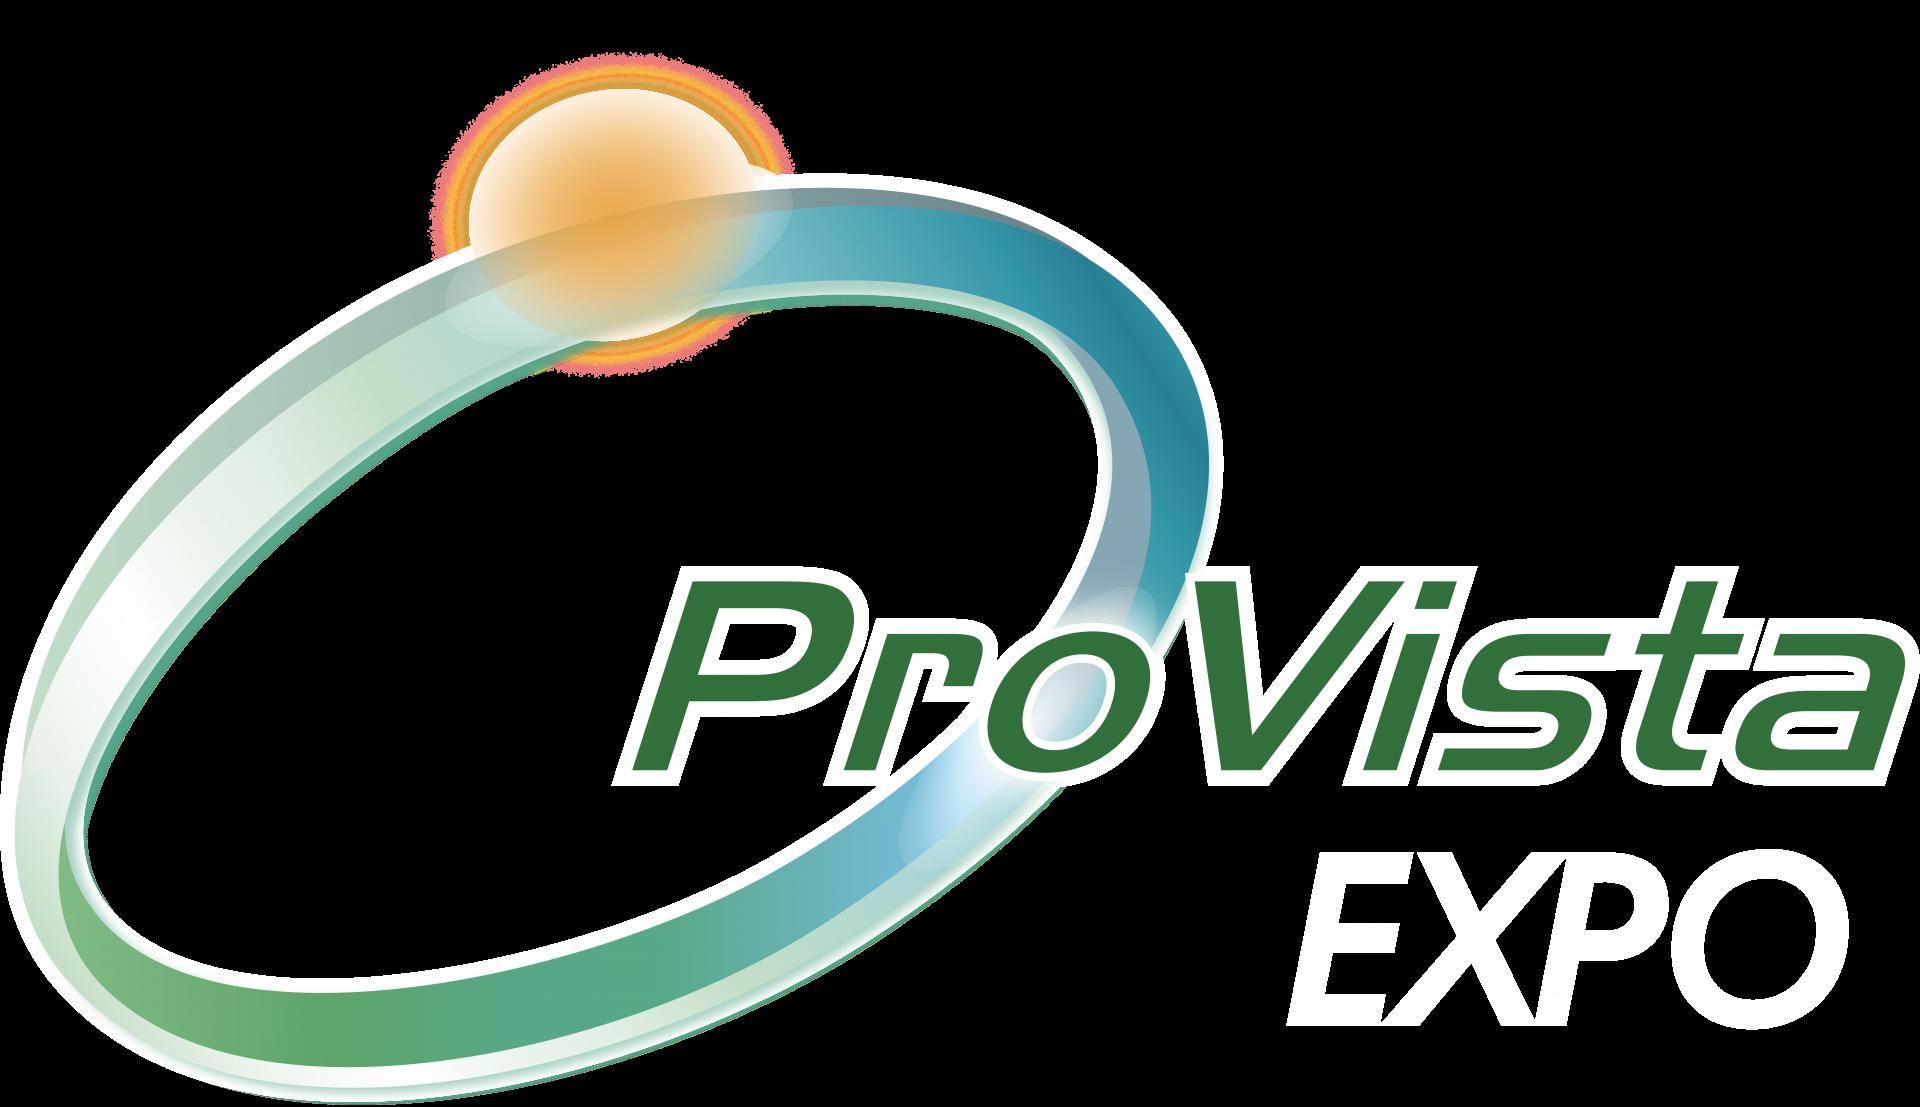 ProVista Expo